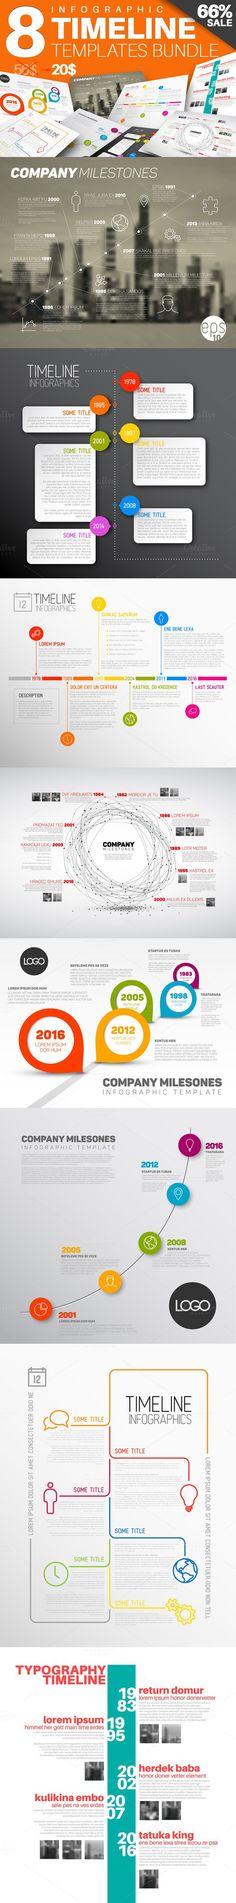 Flat 3D Isometric Business Startup by alexdndz on @creativemarket - timeline templates